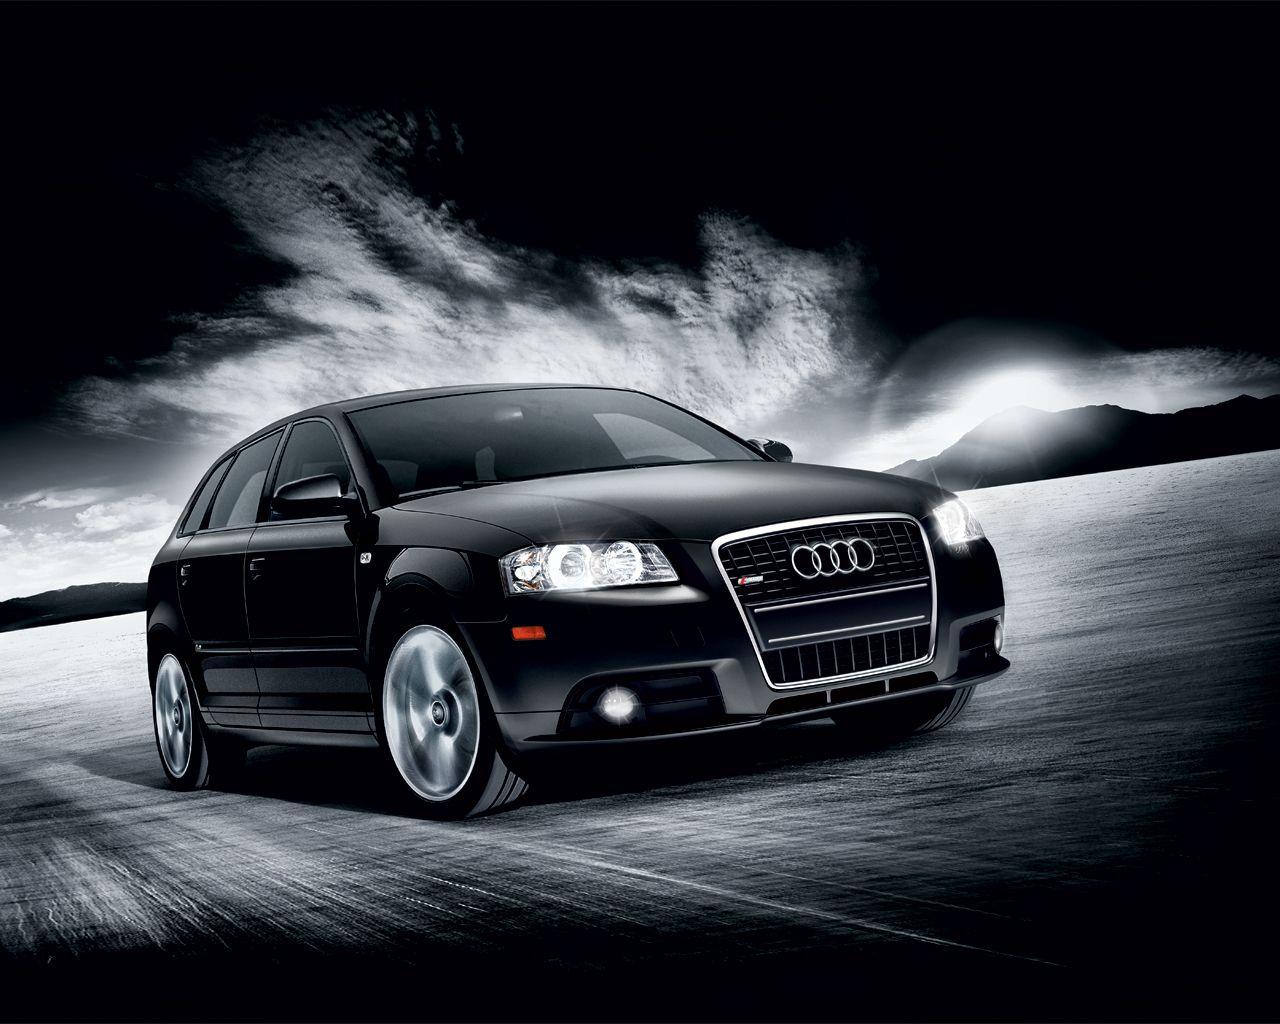 Audi A3 2014 Black Wallpaper Hd Audi A3 Audi A3 Sportback Grey Car